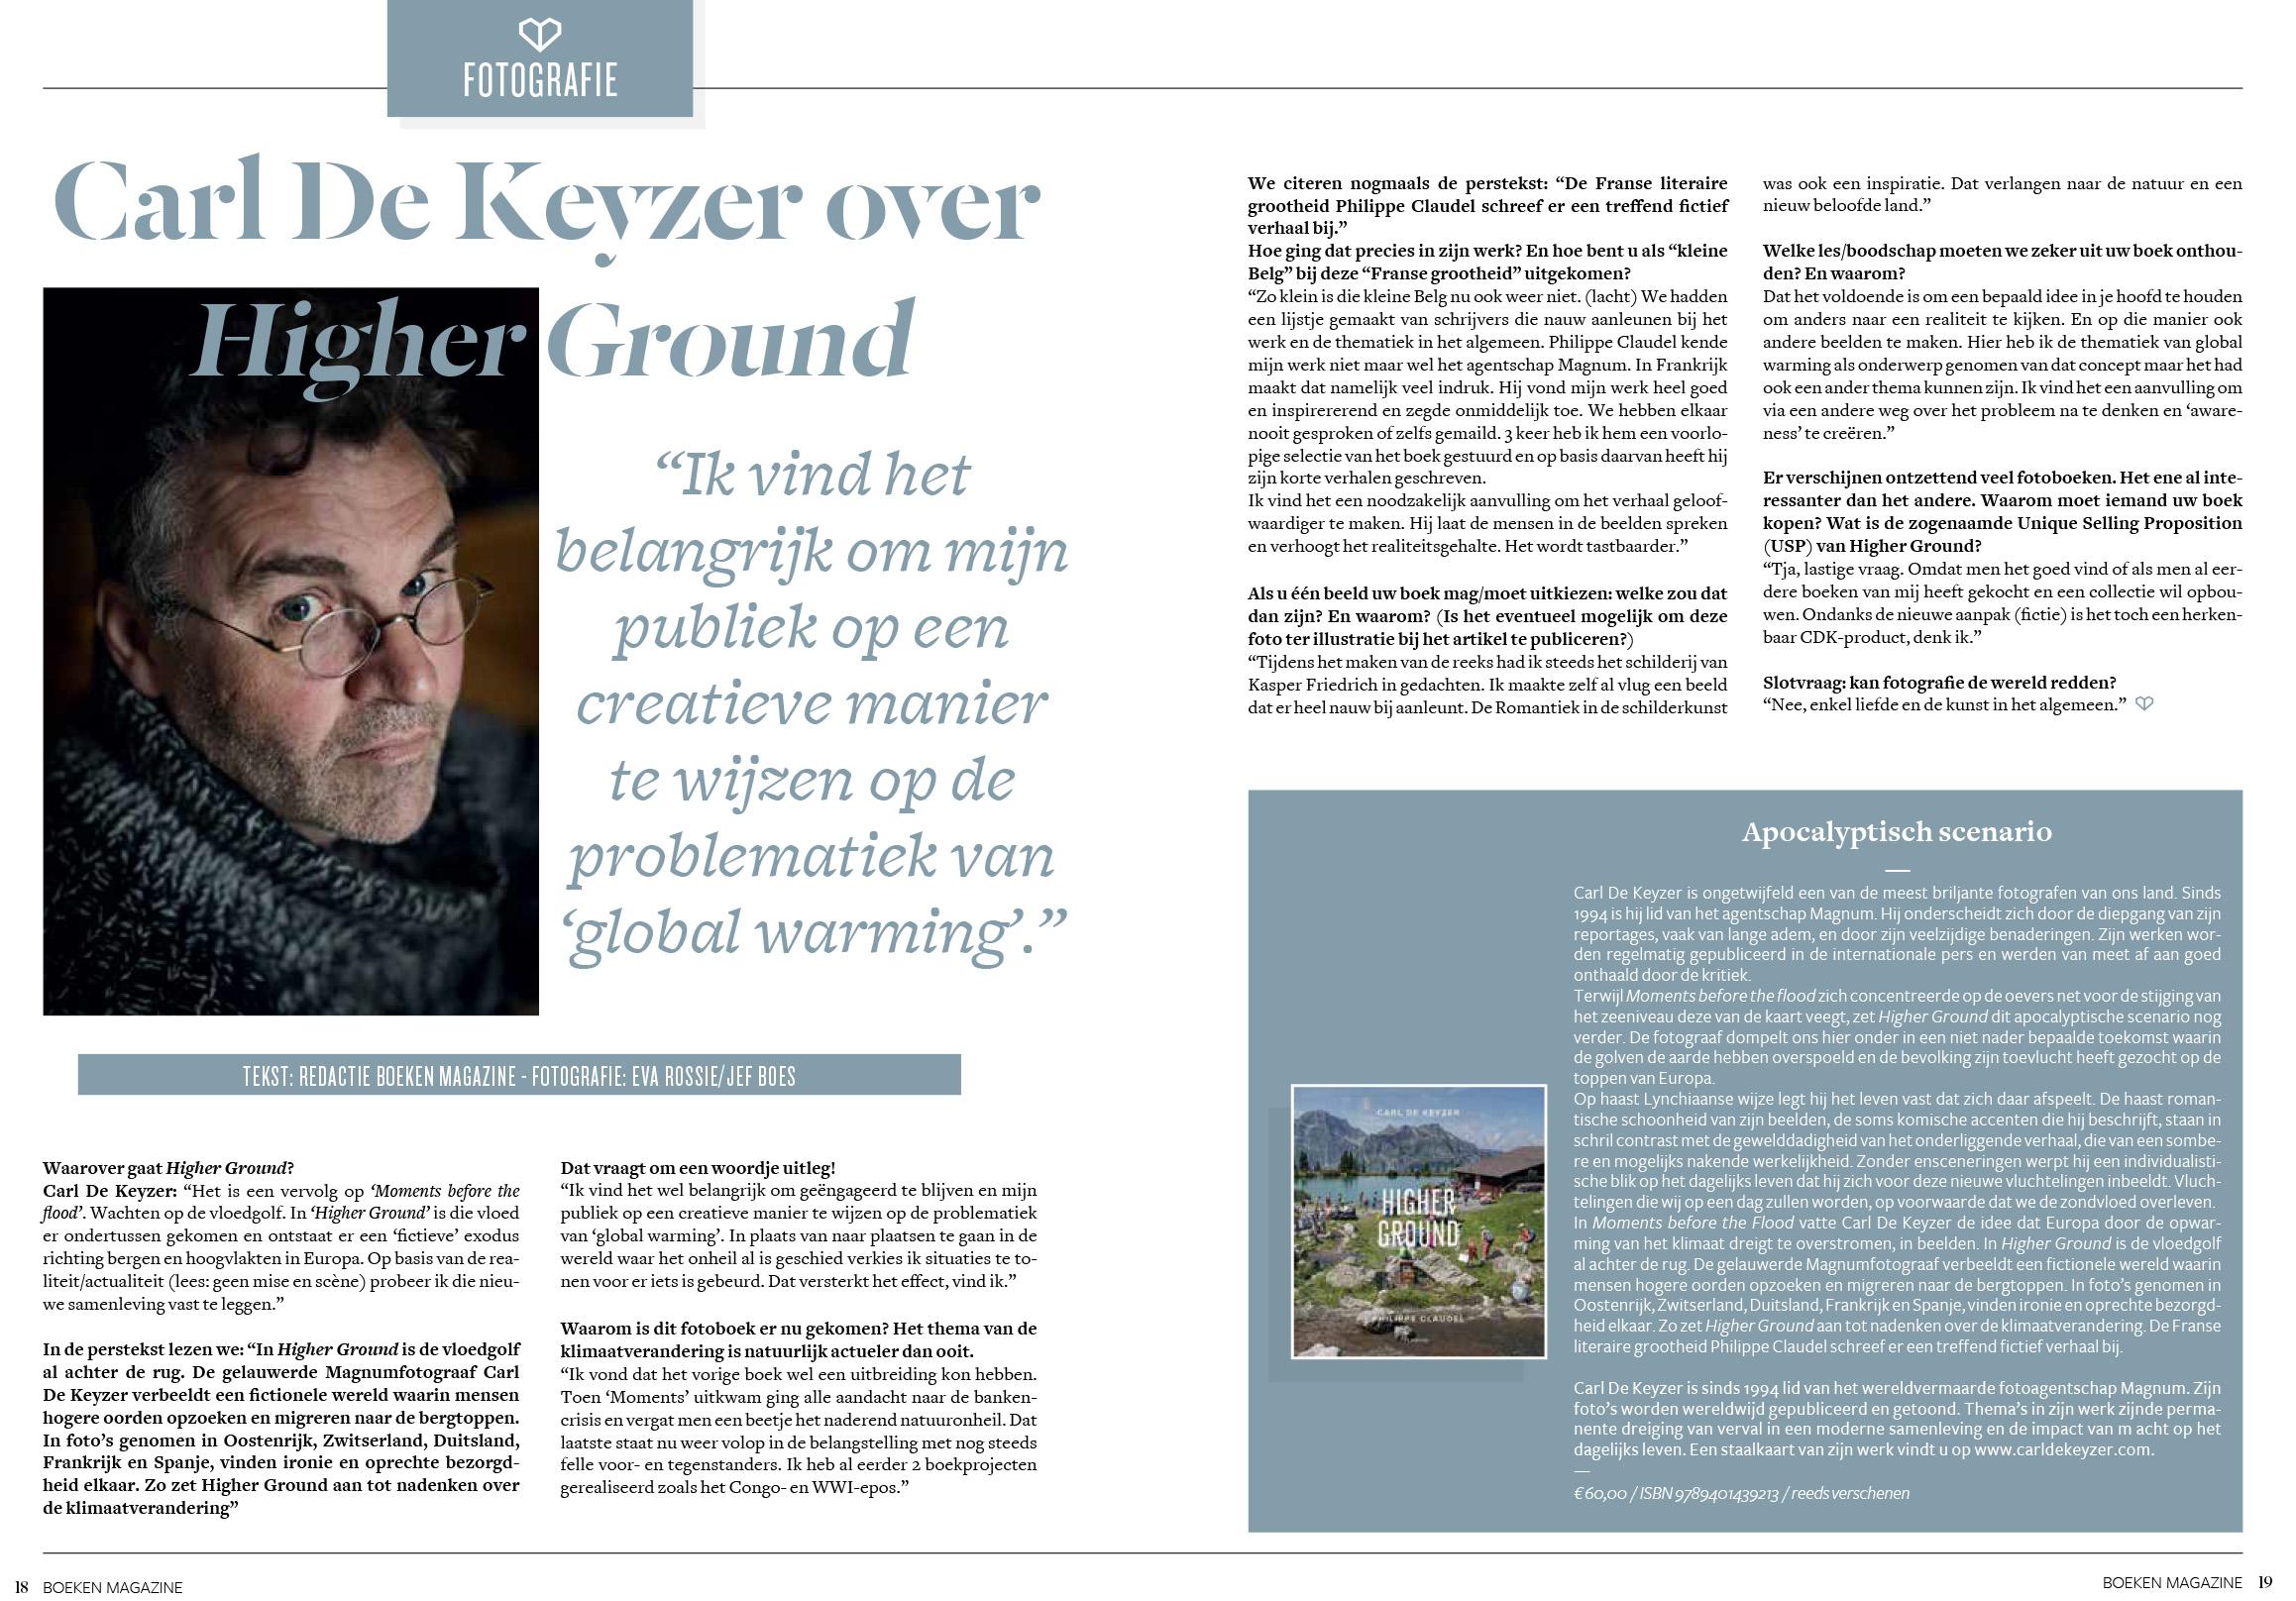 Boekenmagazine (Higher Ground)